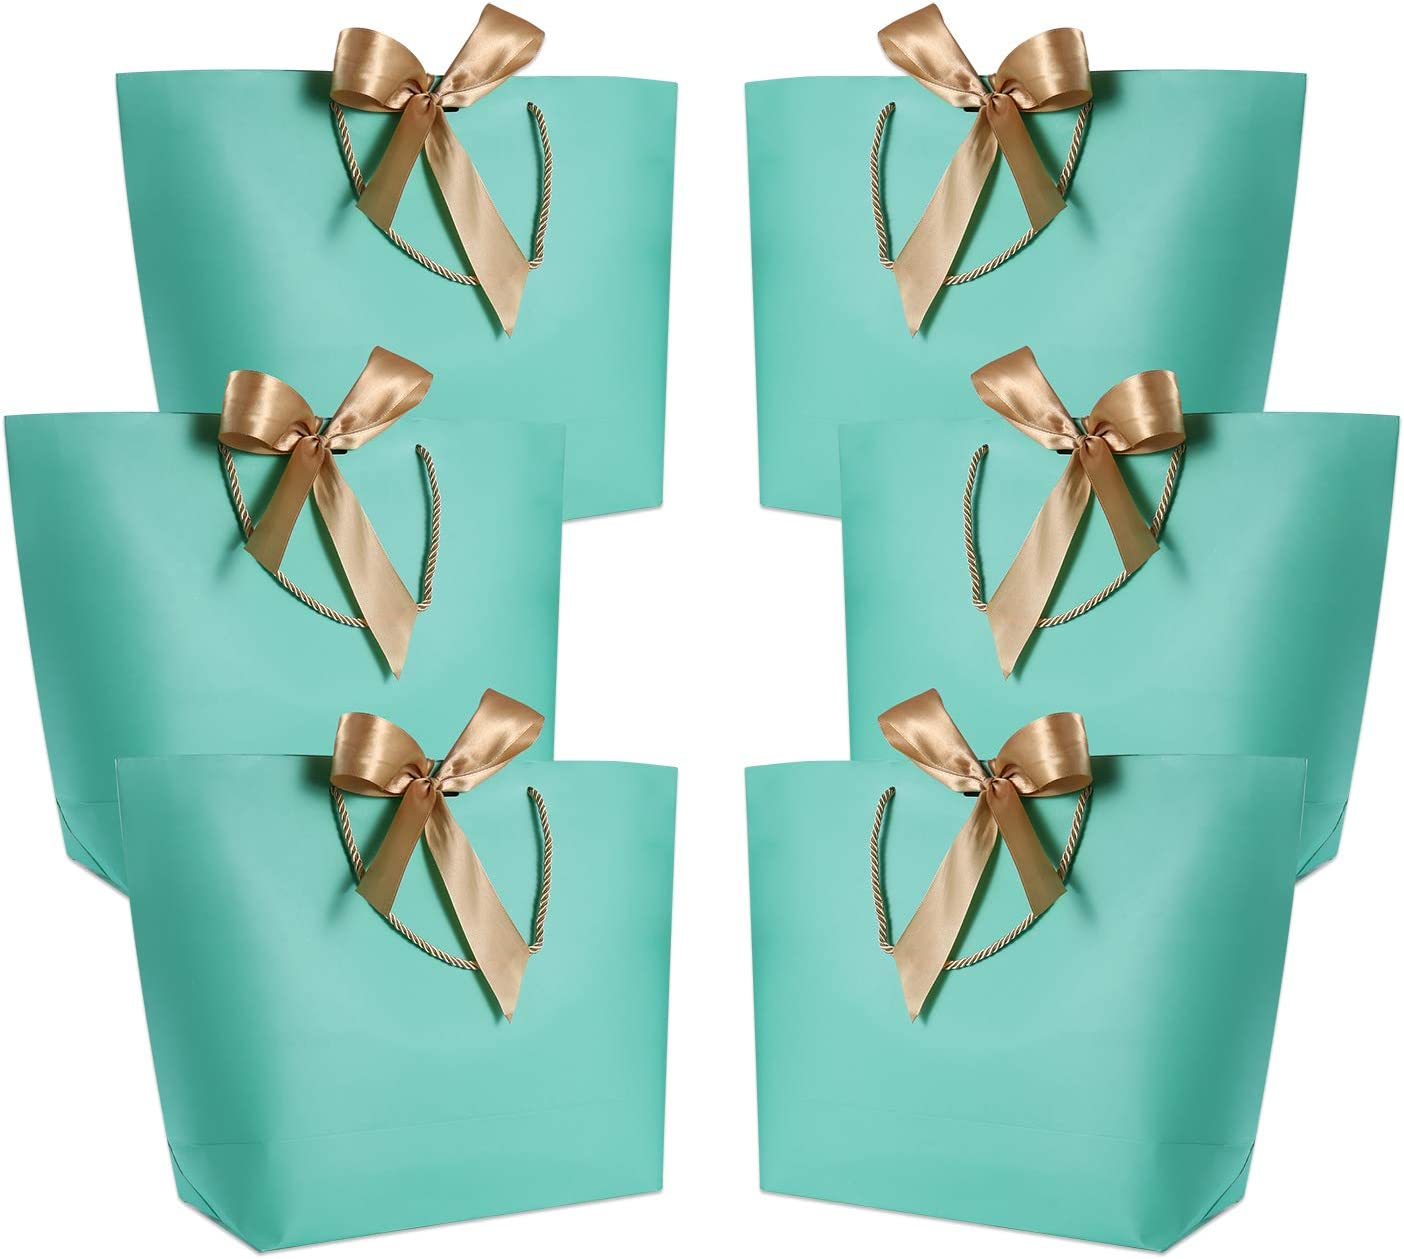 12 x  H23xW18xD9cm..Christmas scene Elf  gift bags with corded handles